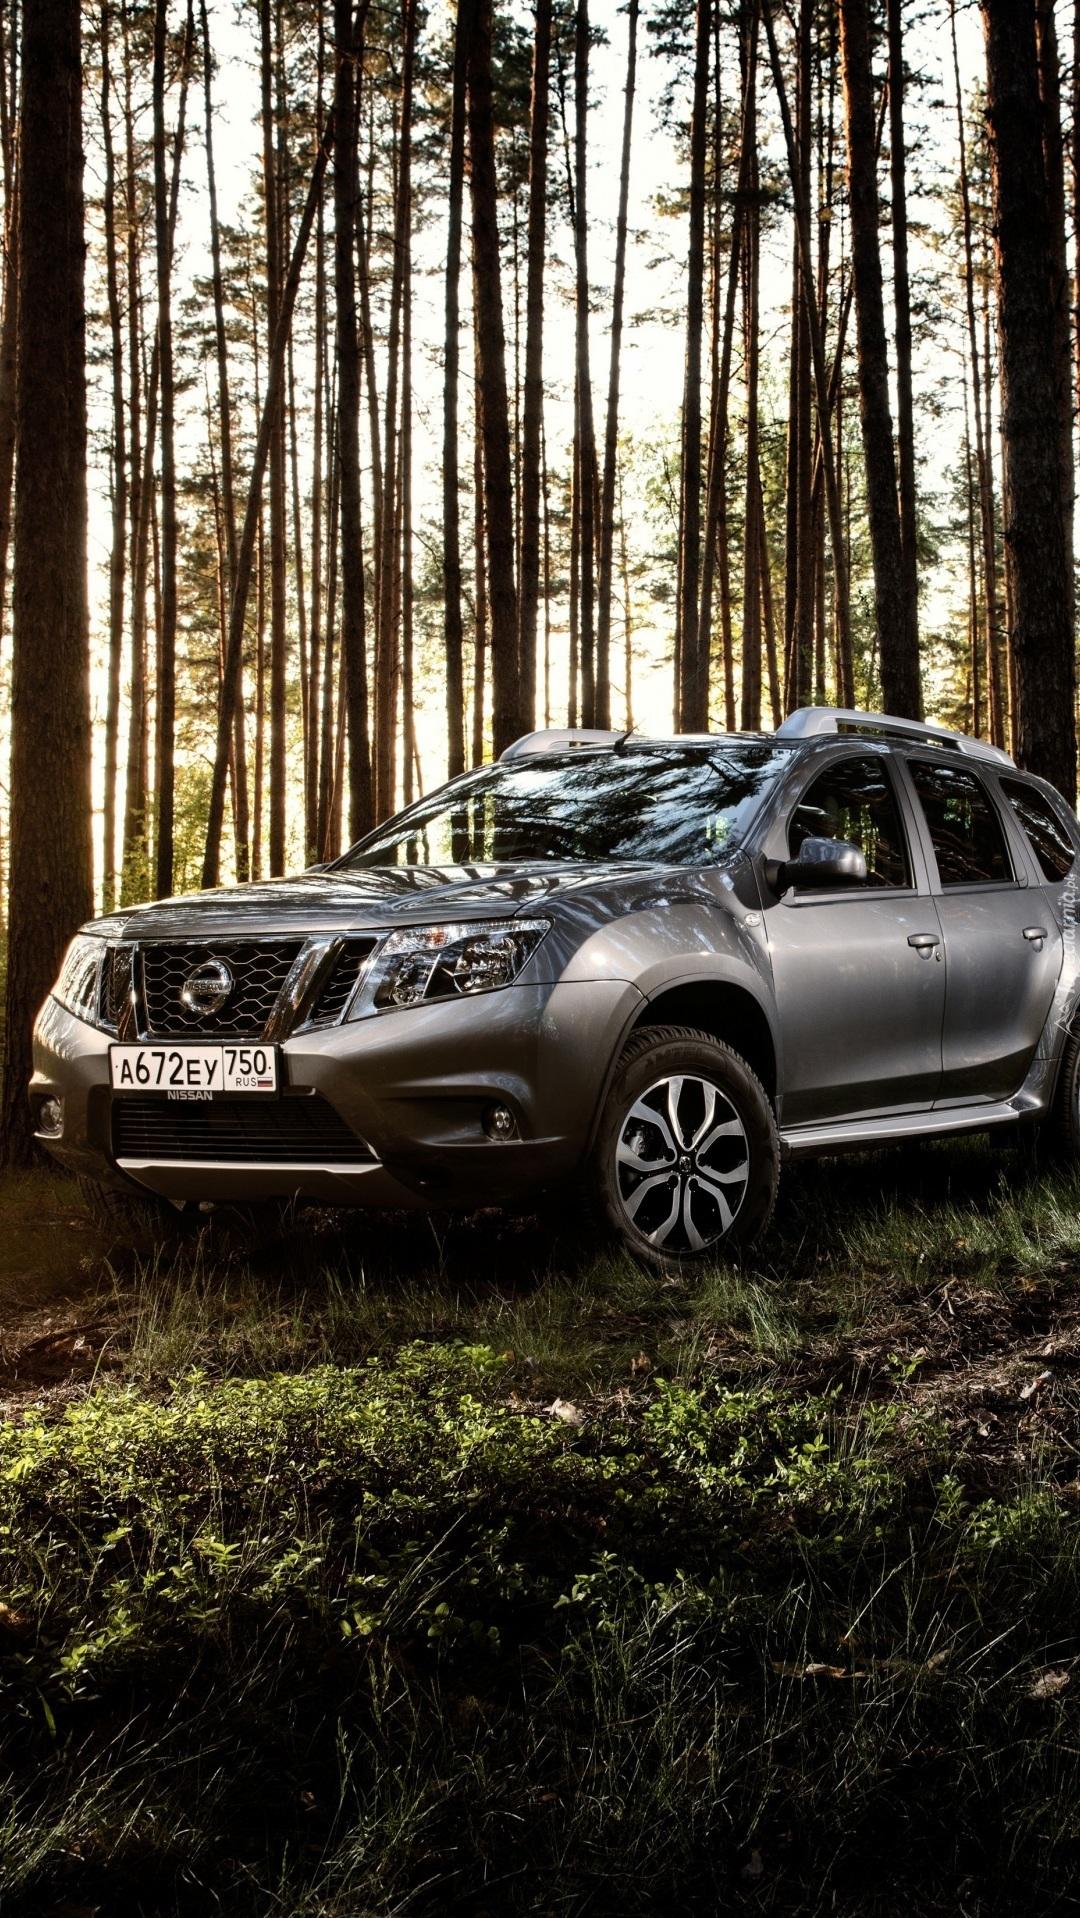 Nissan na polanie w lesie